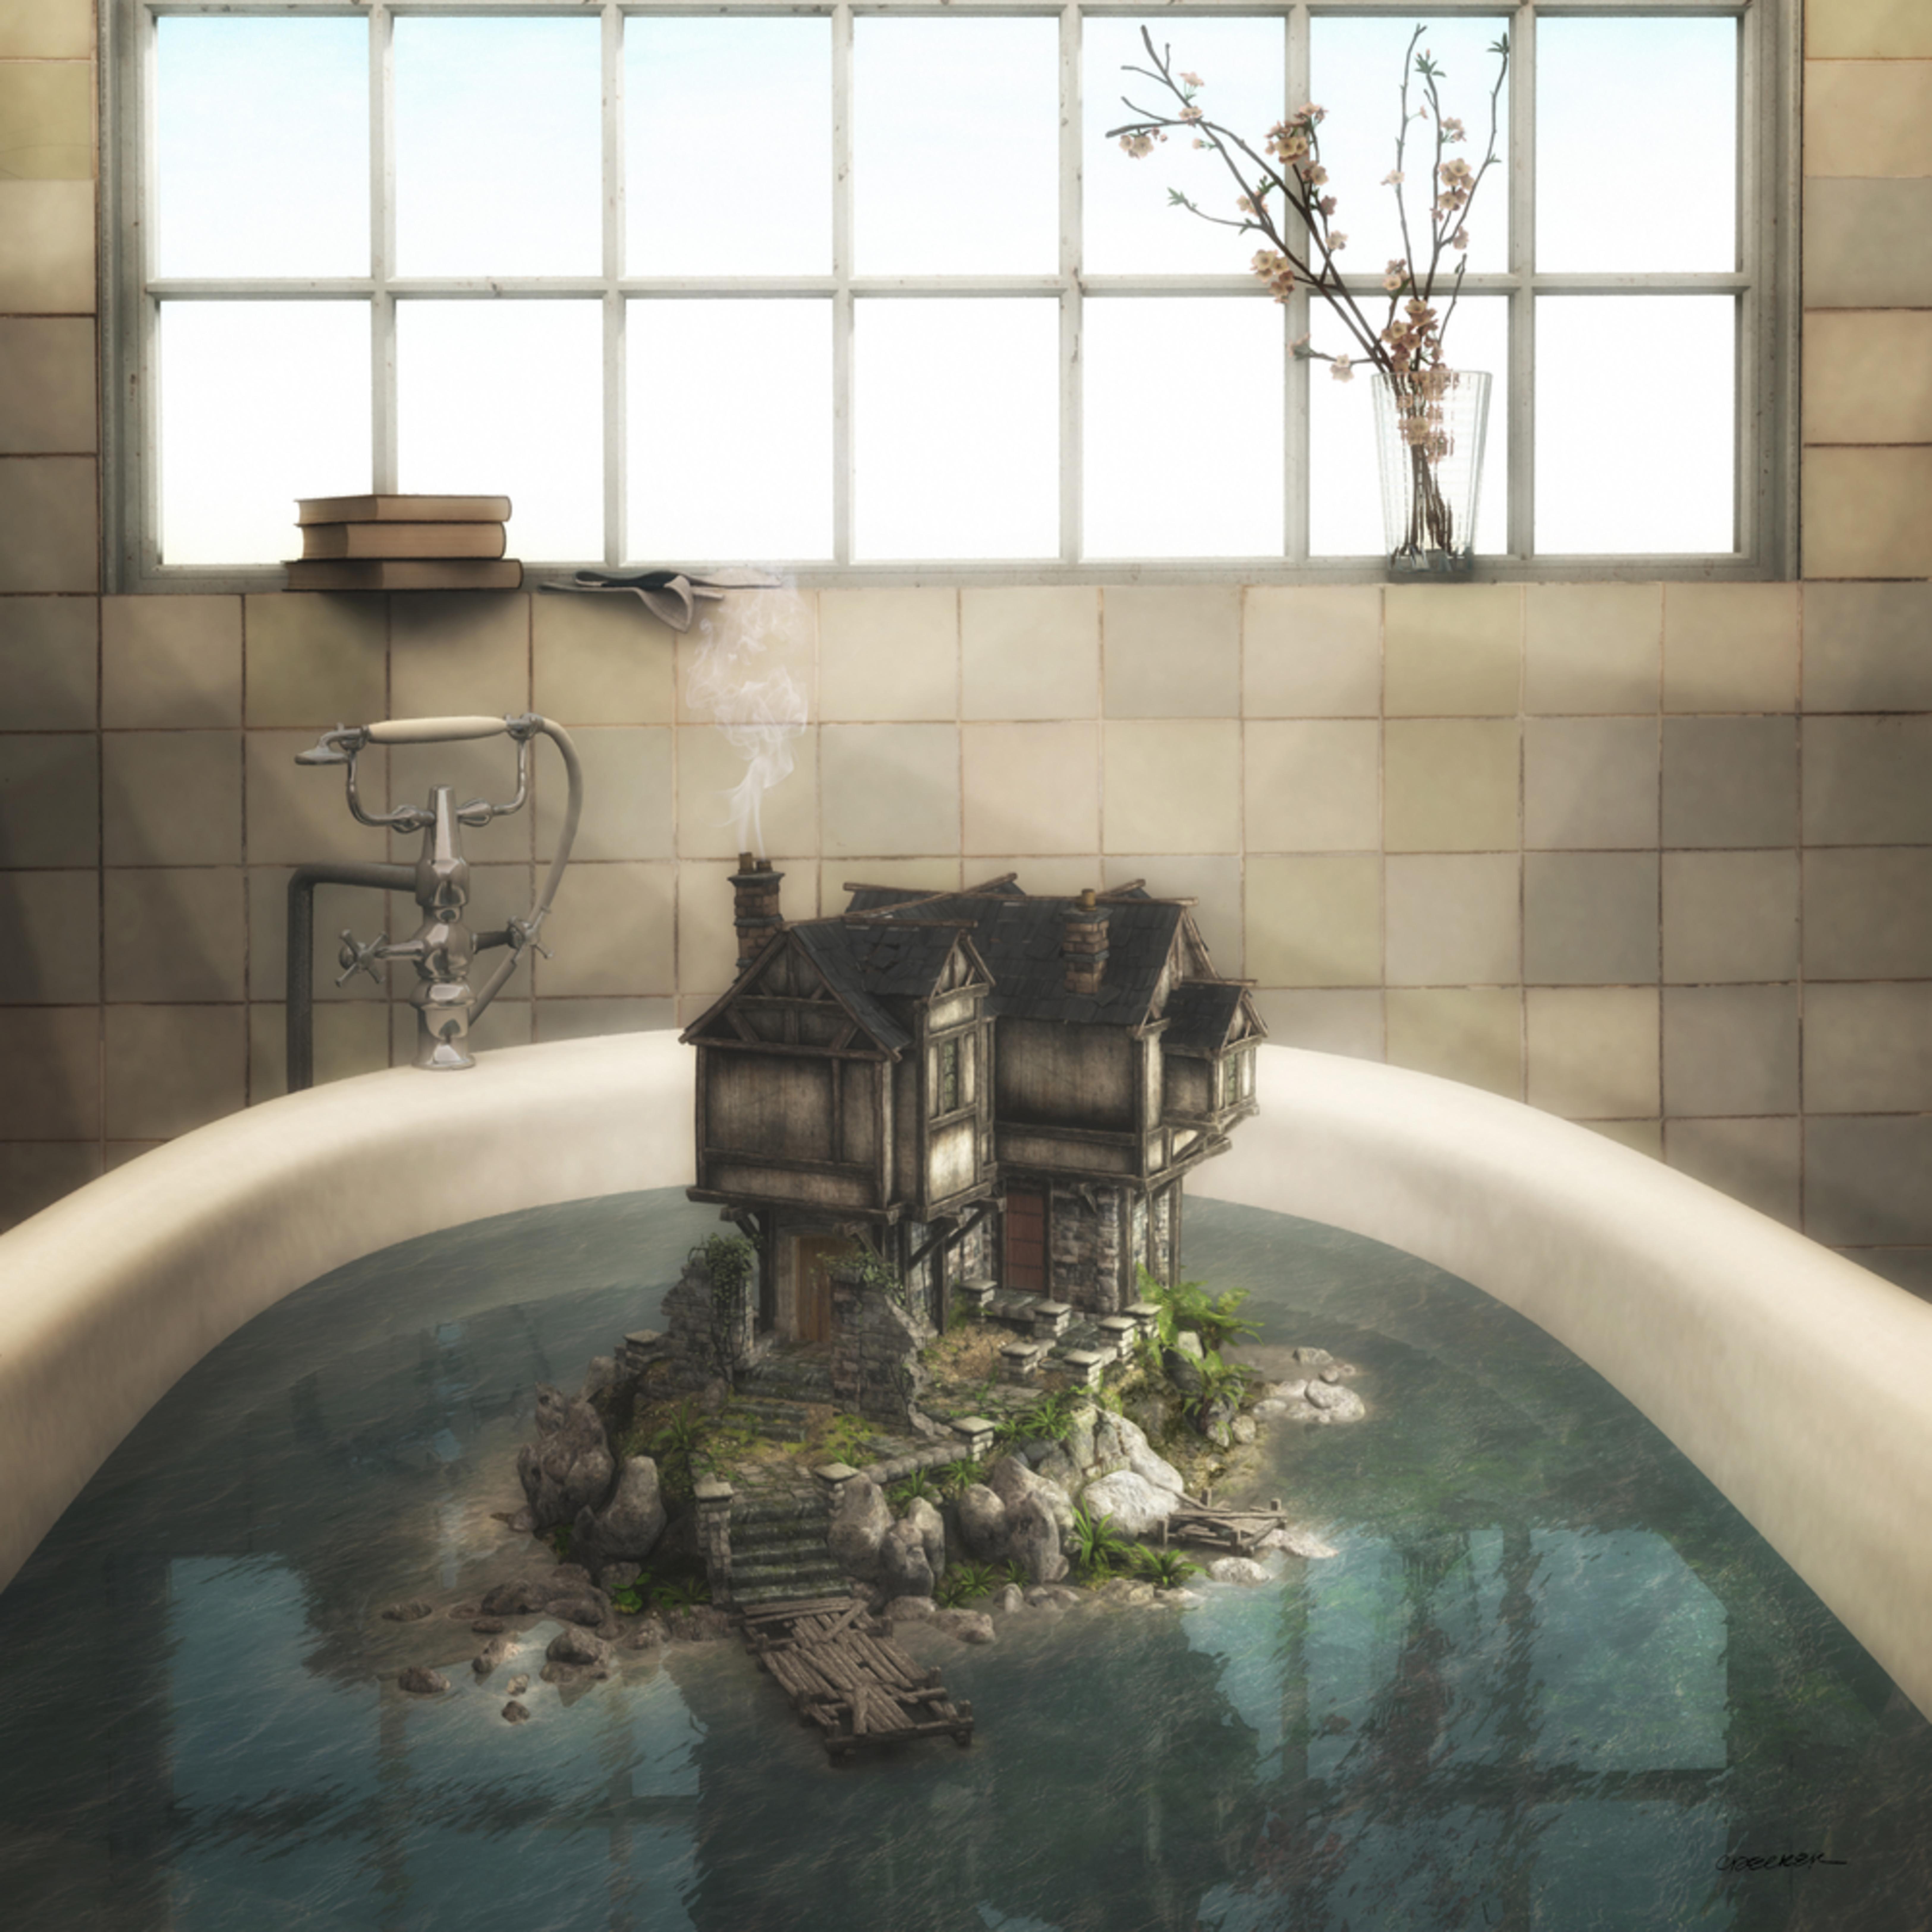 Cdecker bath 6500 qe225w